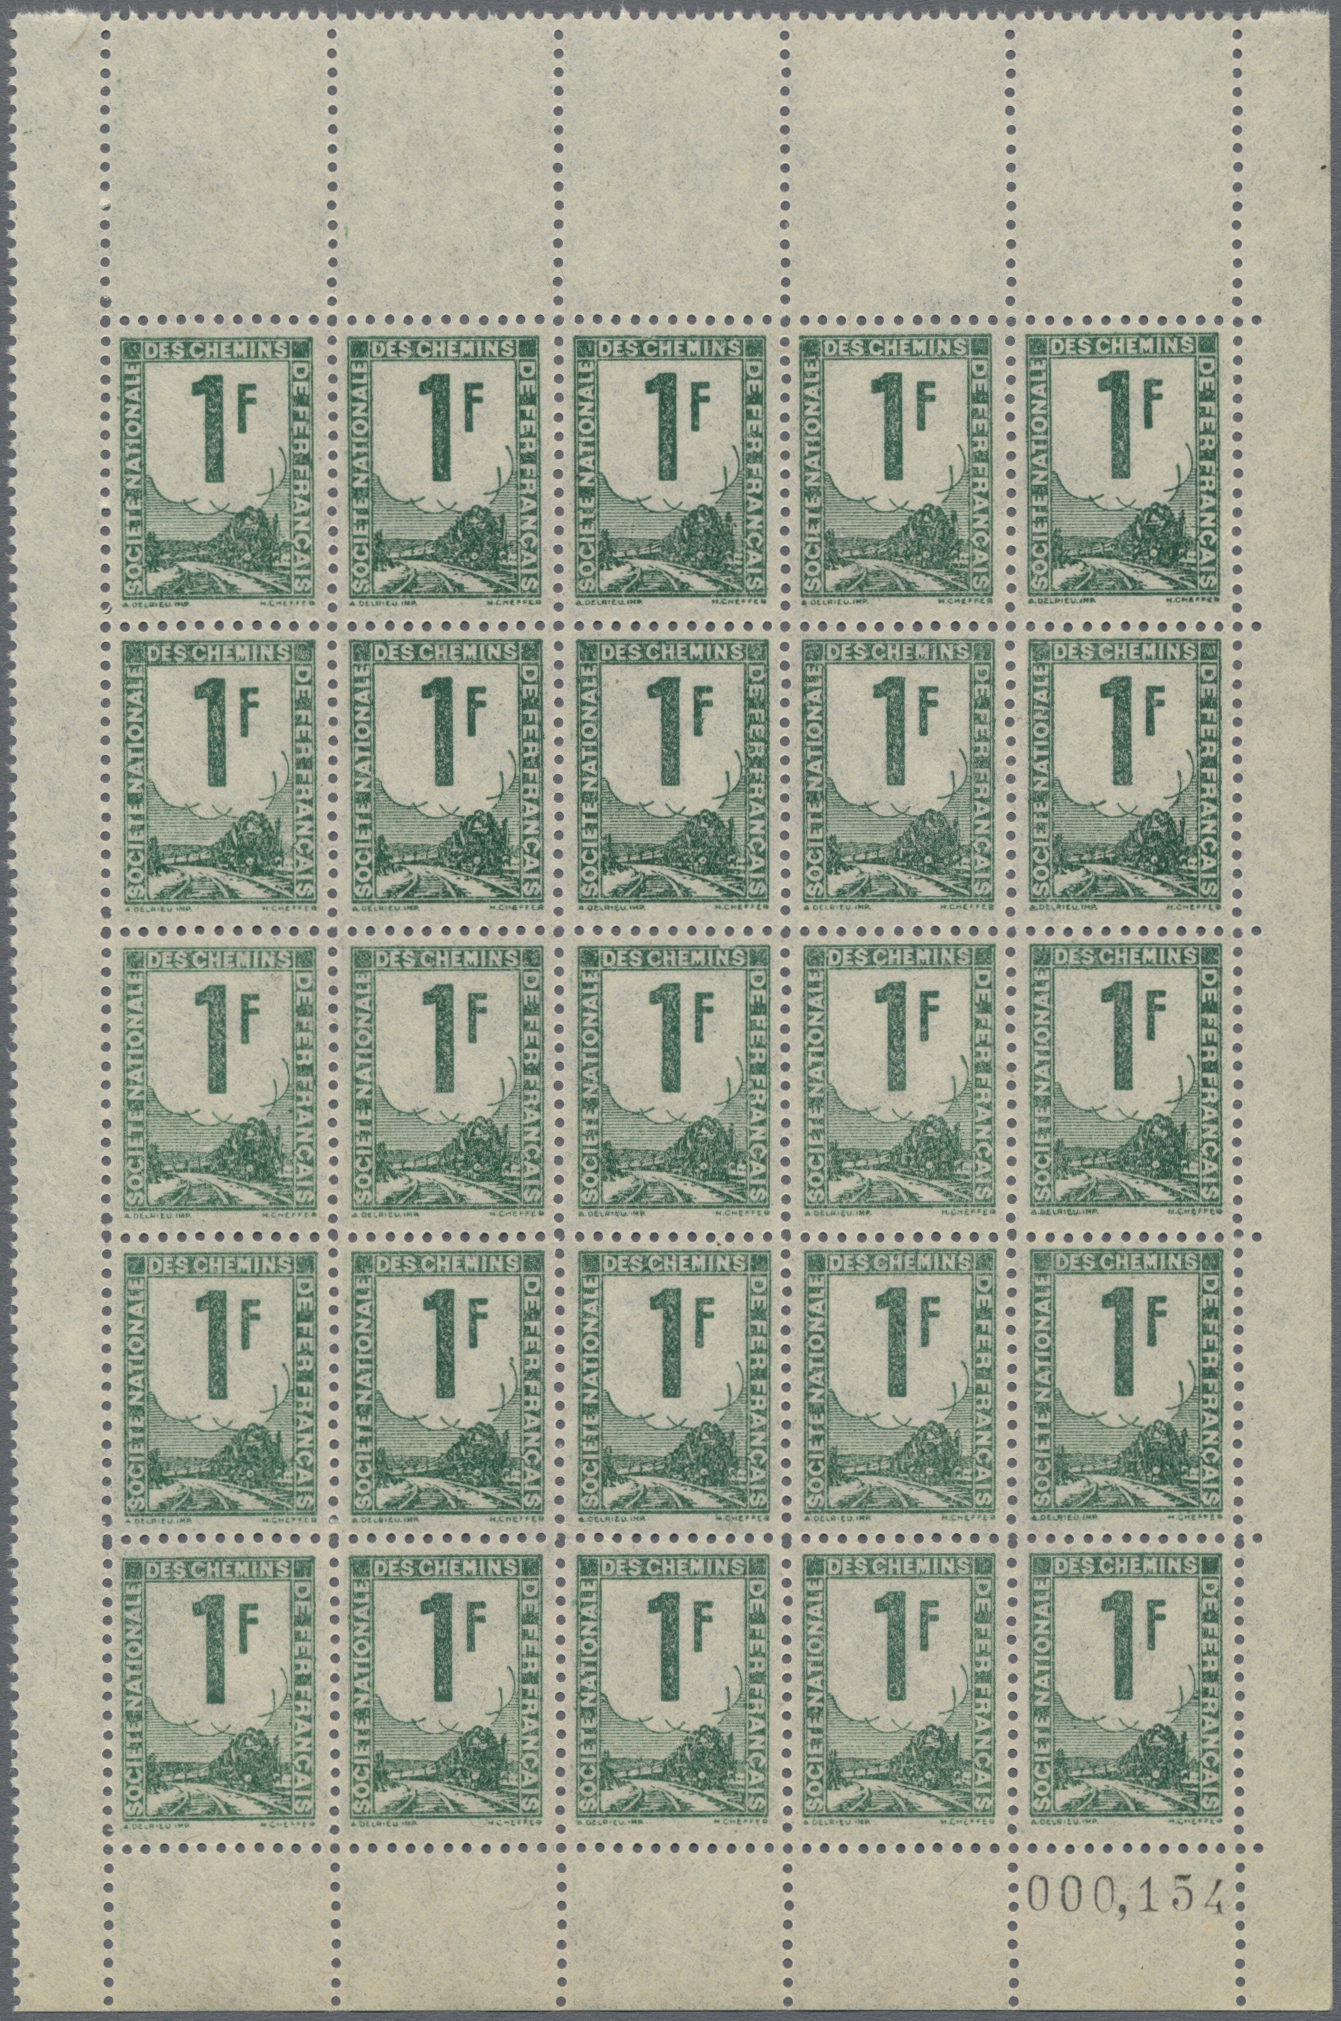 Lot 18346 - Frankreich - Postpaketmarken  -  Auktionshaus Christoph Gärtner GmbH & Co. KG 50th Auction Anniversary Auction - Day 5